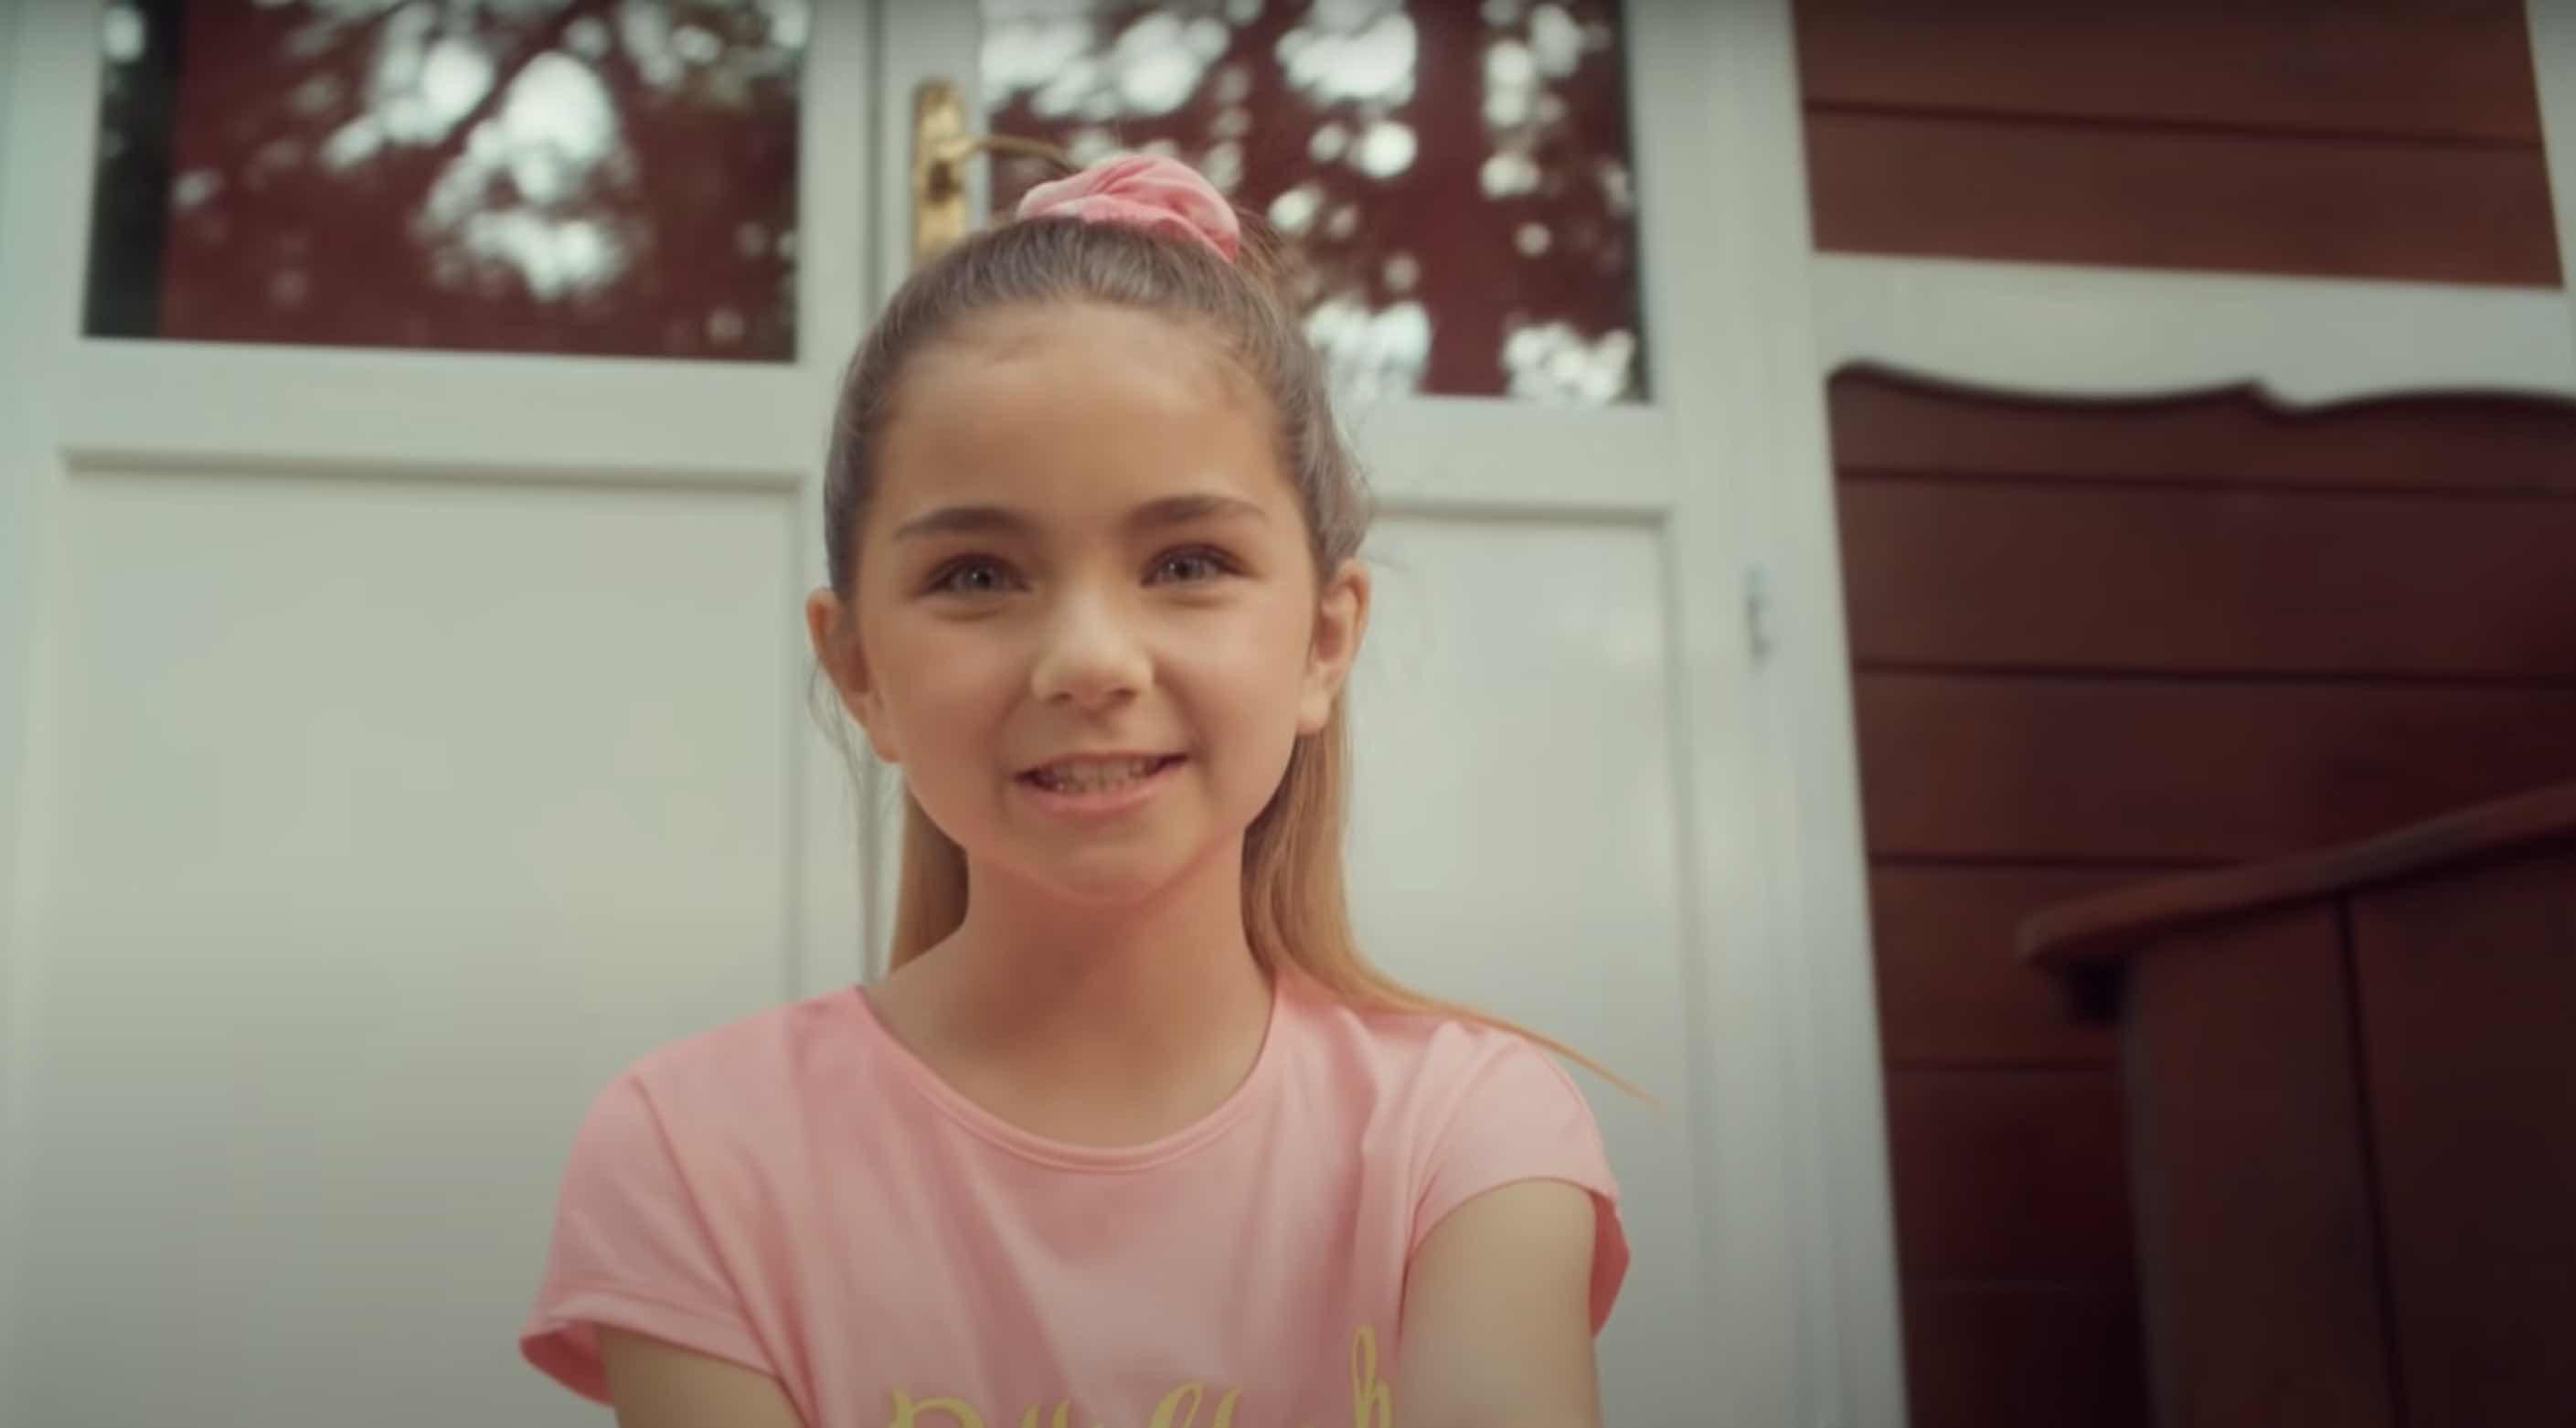 Valentina - Plus loin qu'un rêve - album - y a pas que les grands qui rêvent -